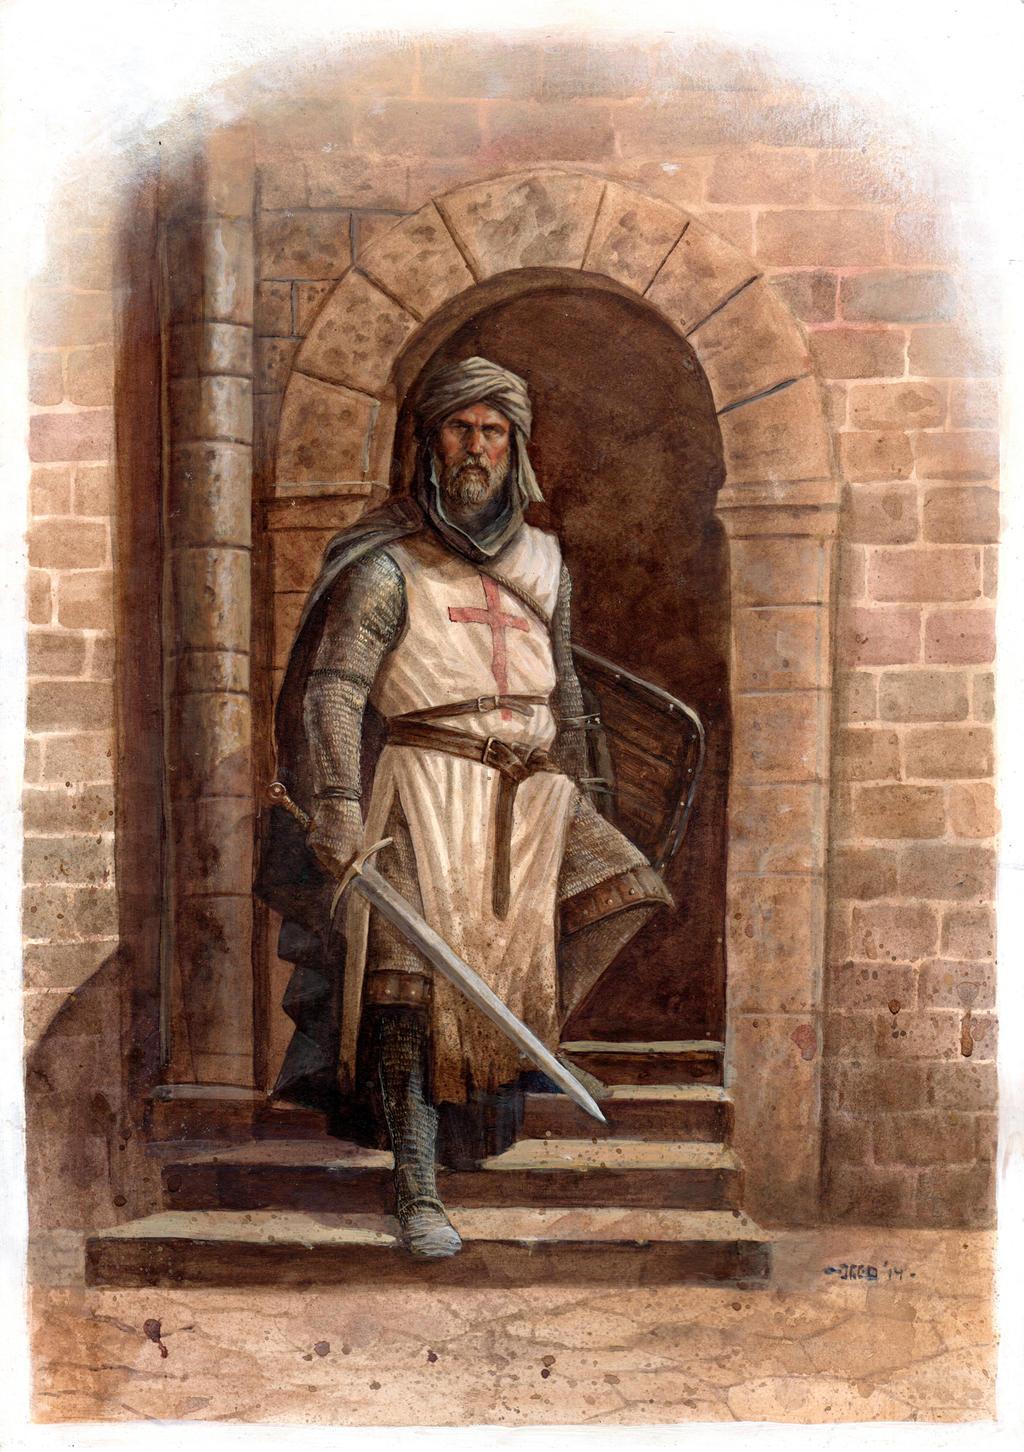 Crusader by Nordheimer